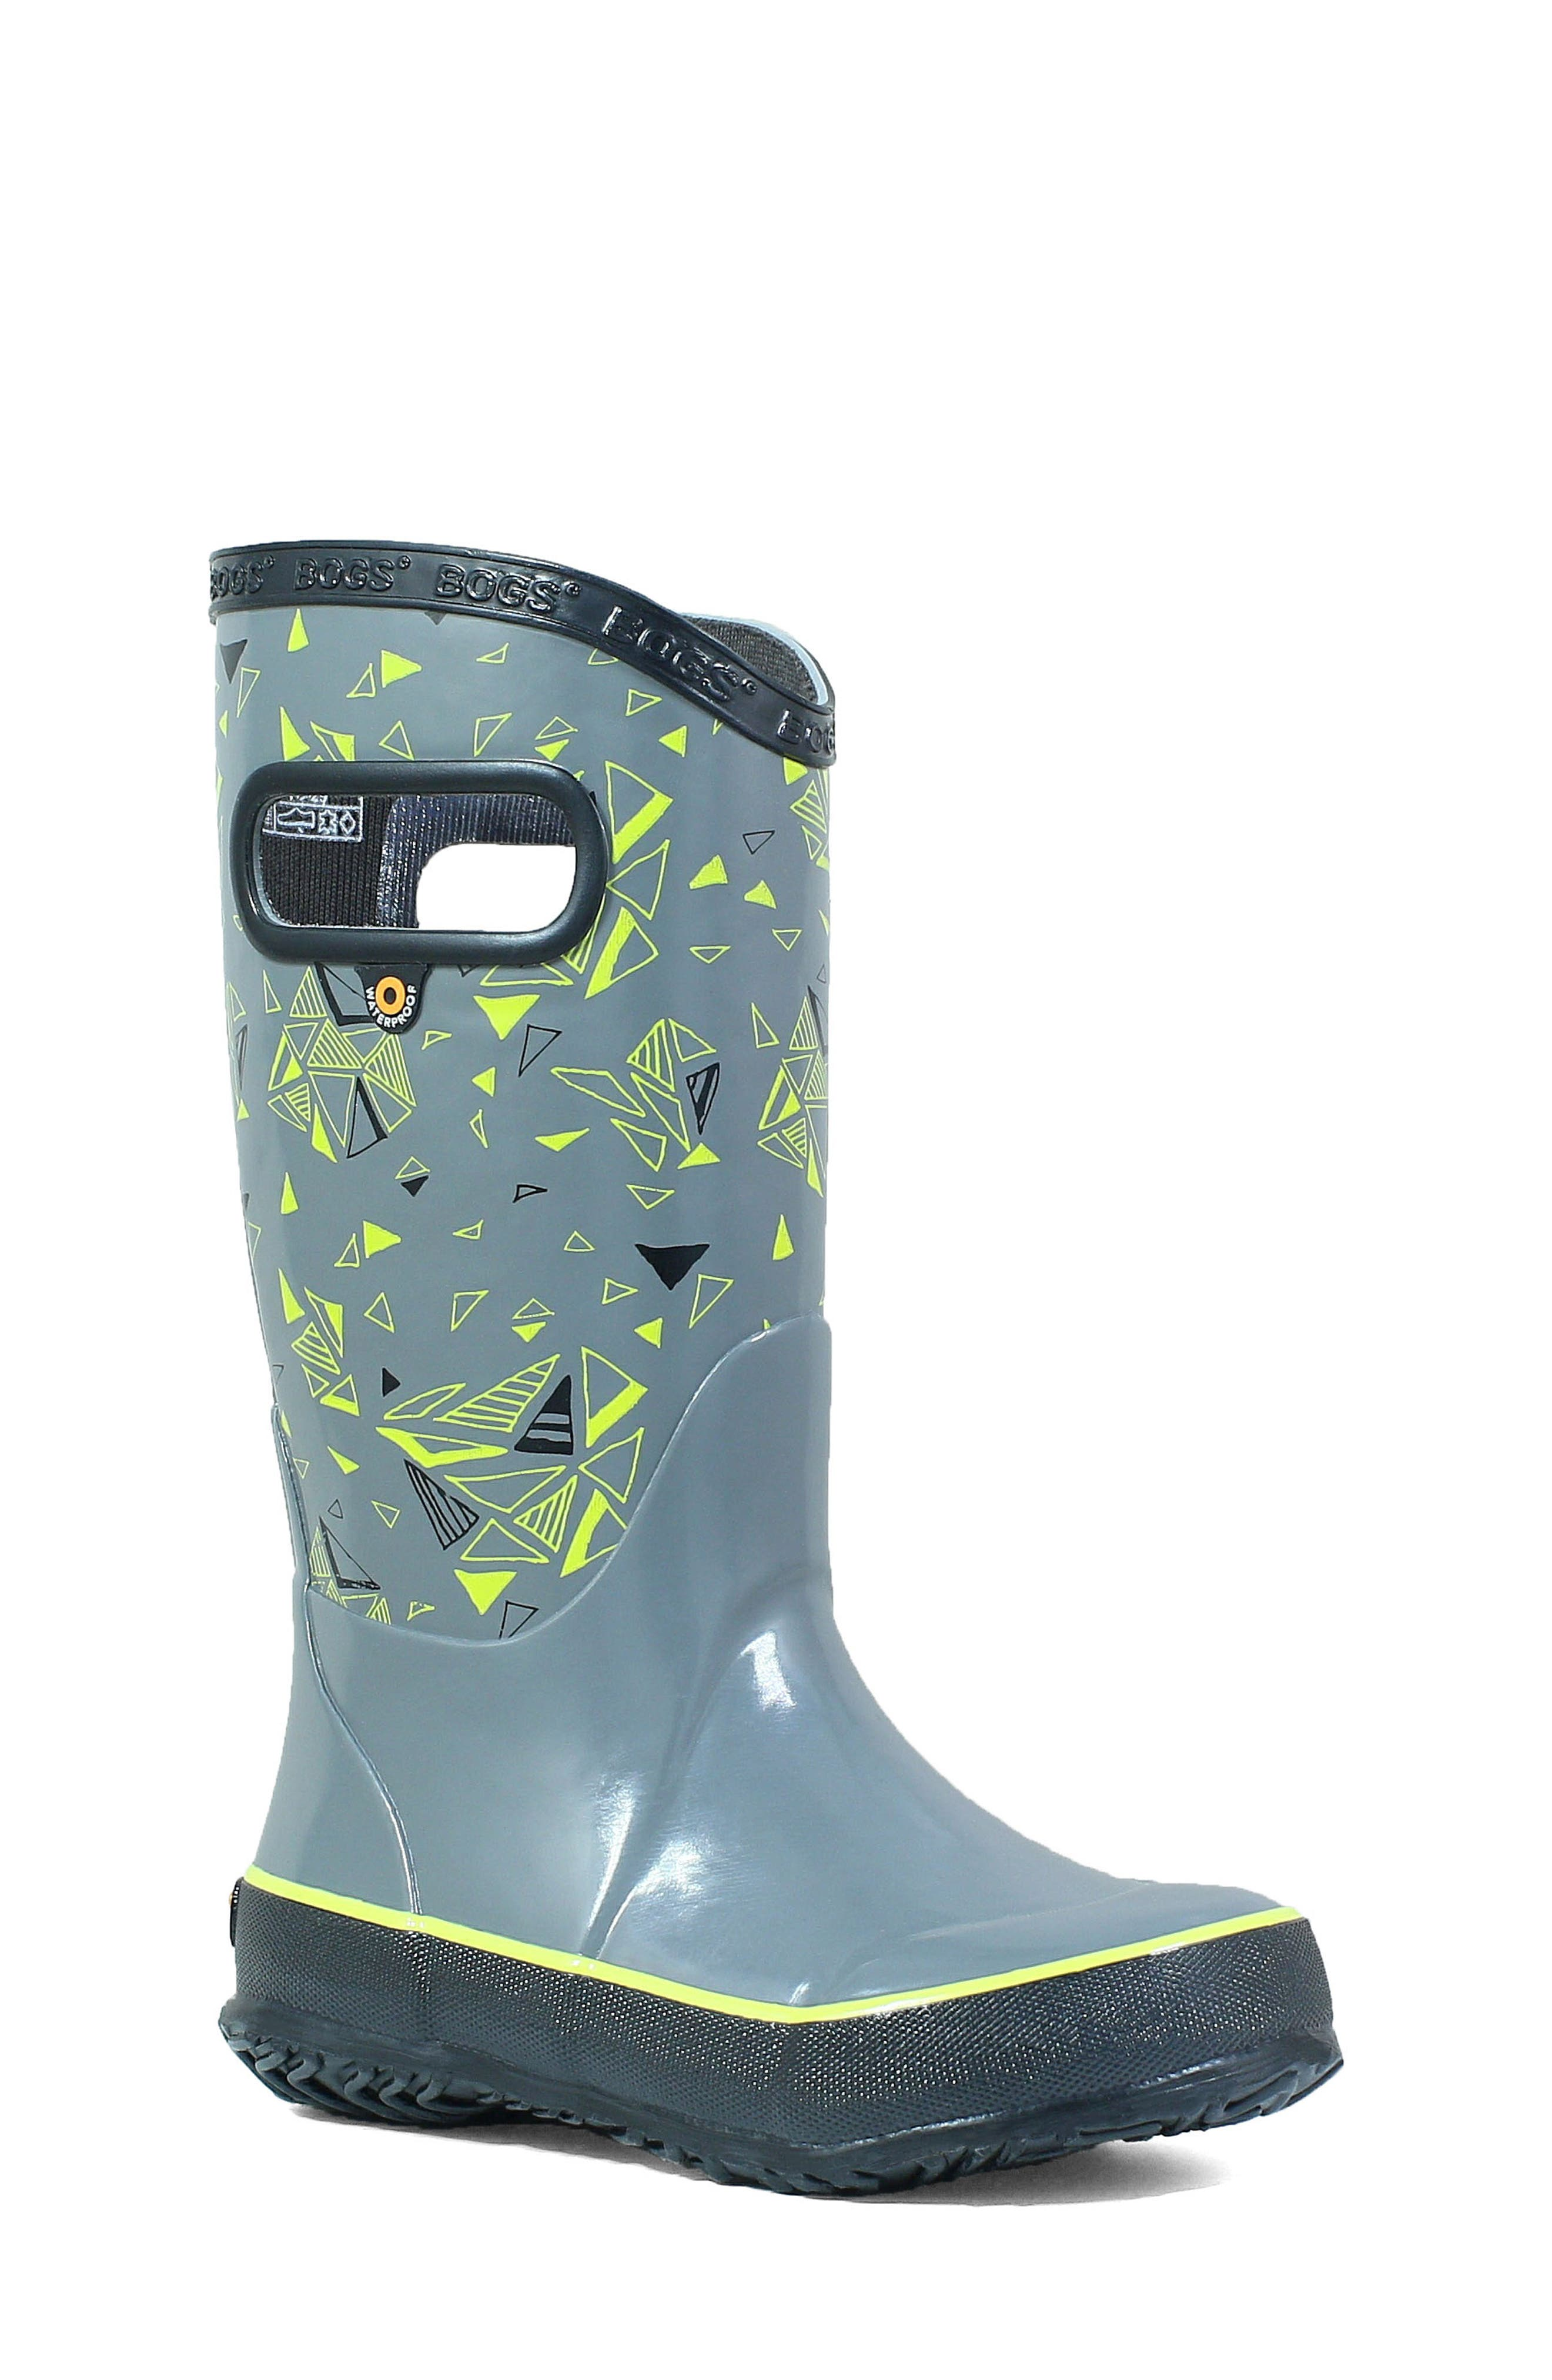 BOGS, Triego Waterproof Rain Boot, Main thumbnail 1, color, GRAY MULTI